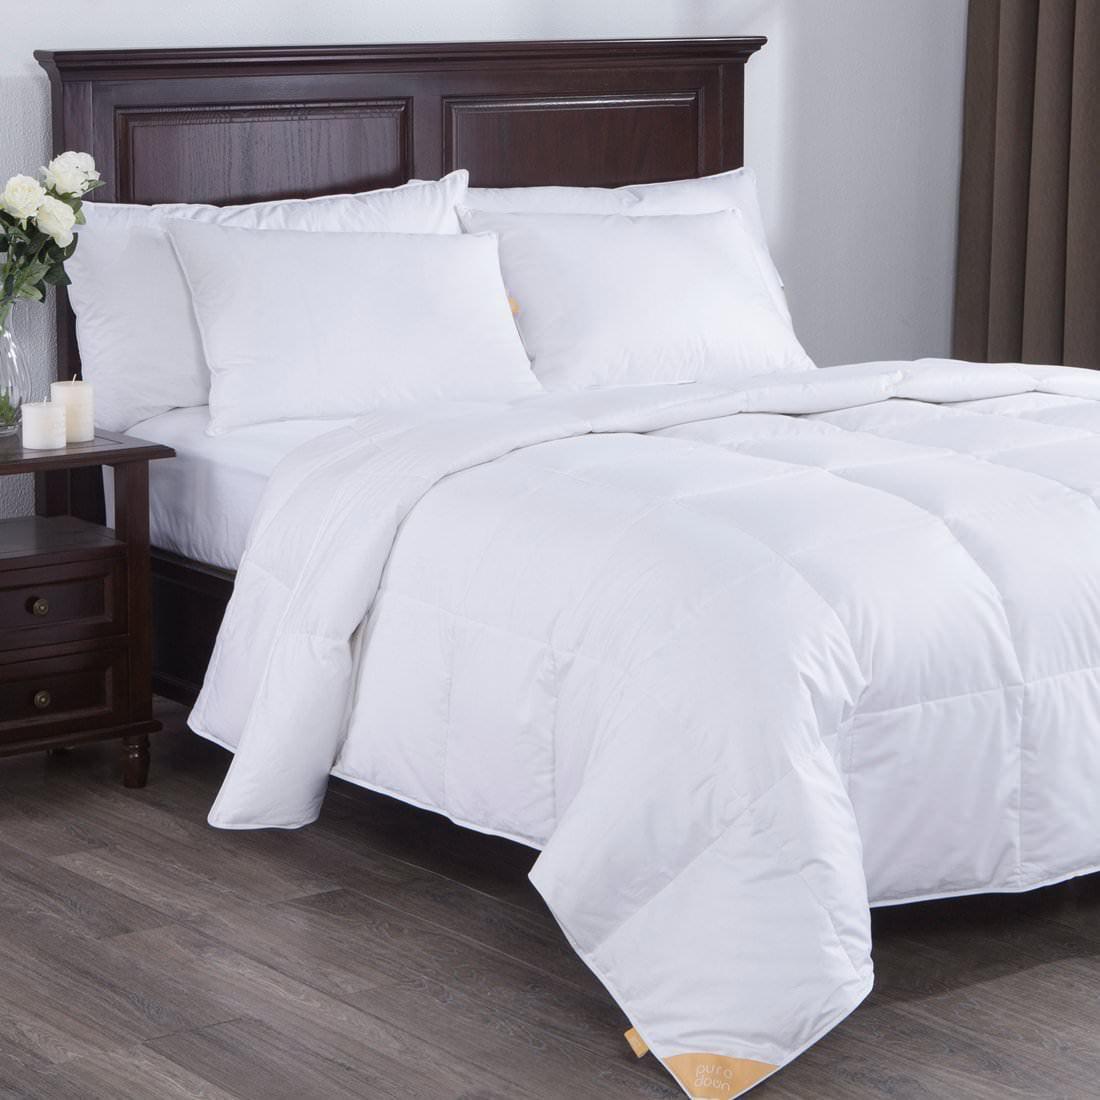 Puredown Lightweight White Goose Down Comforter Duvet Insert 300 Thread Count 100% Cotton Fabric, 600 Fill Power, Twin Size, White